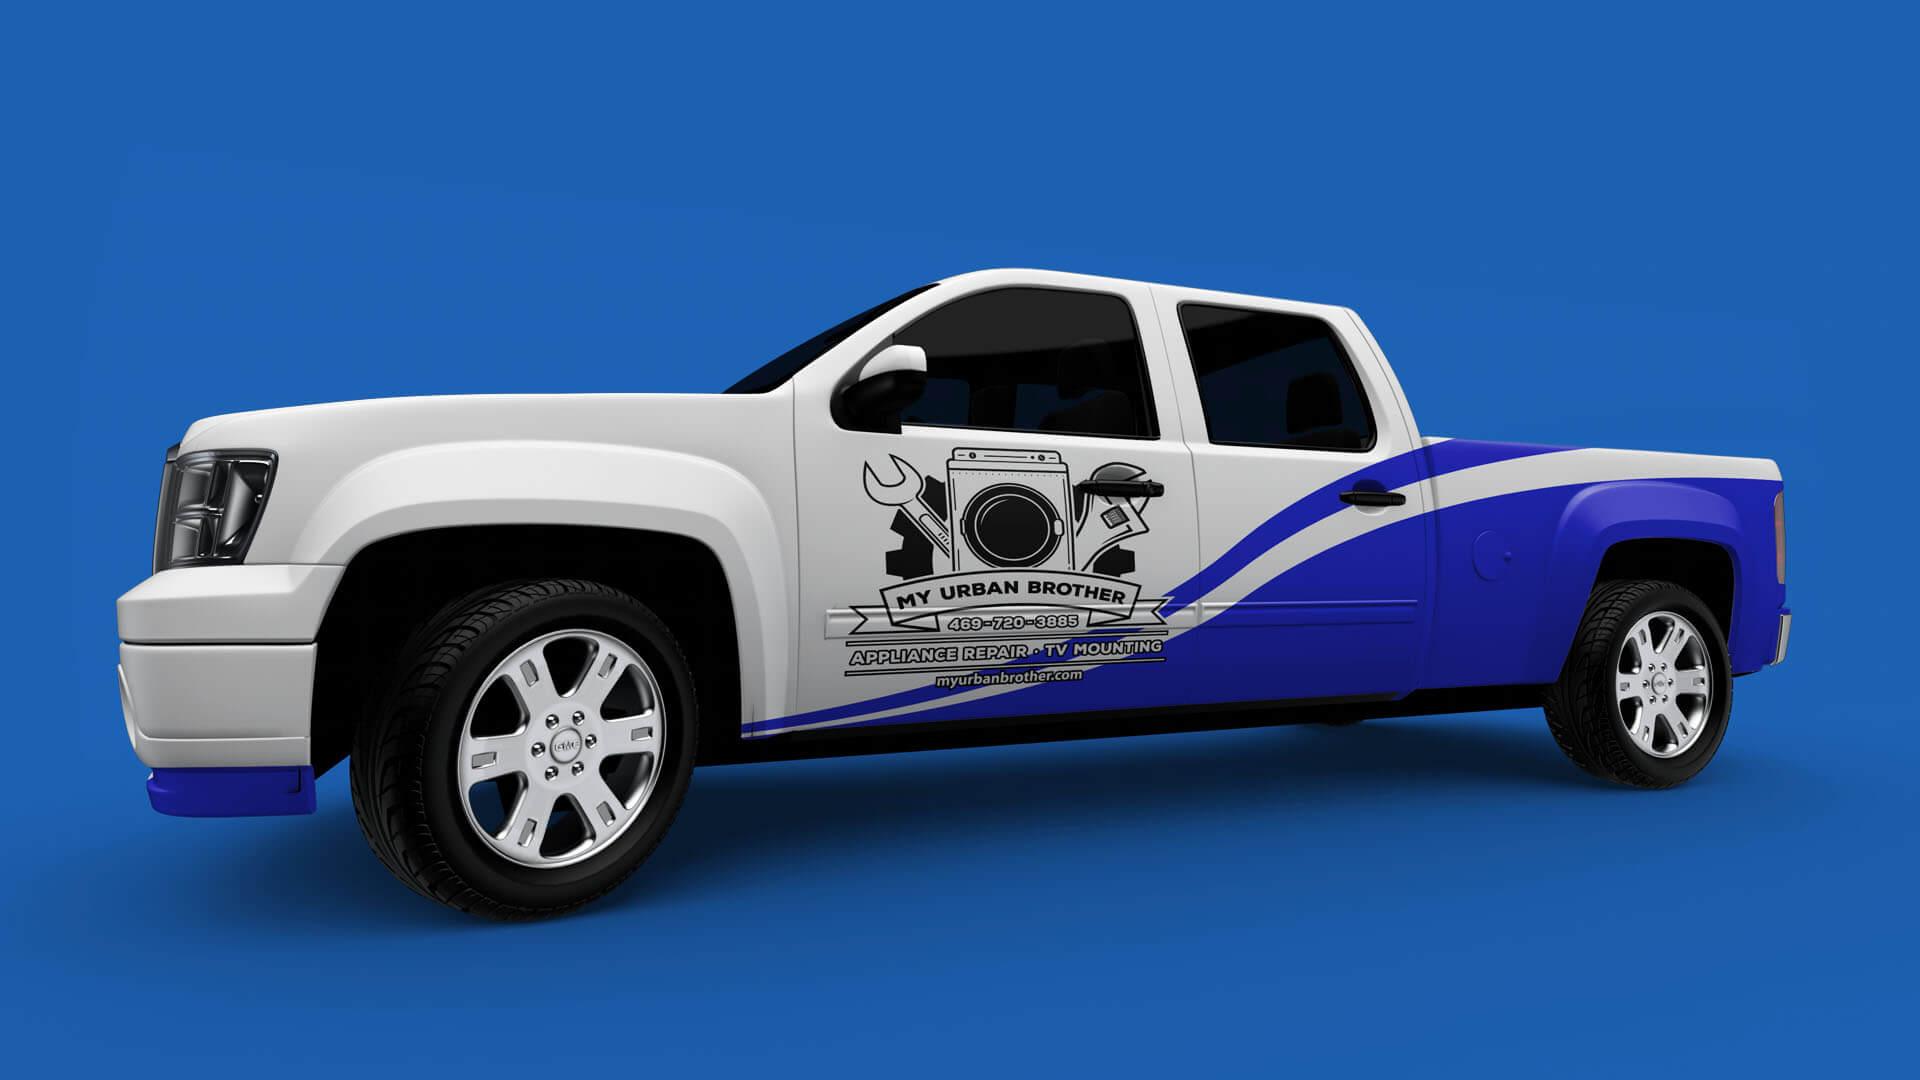 Urban Brothers vehicle wrap